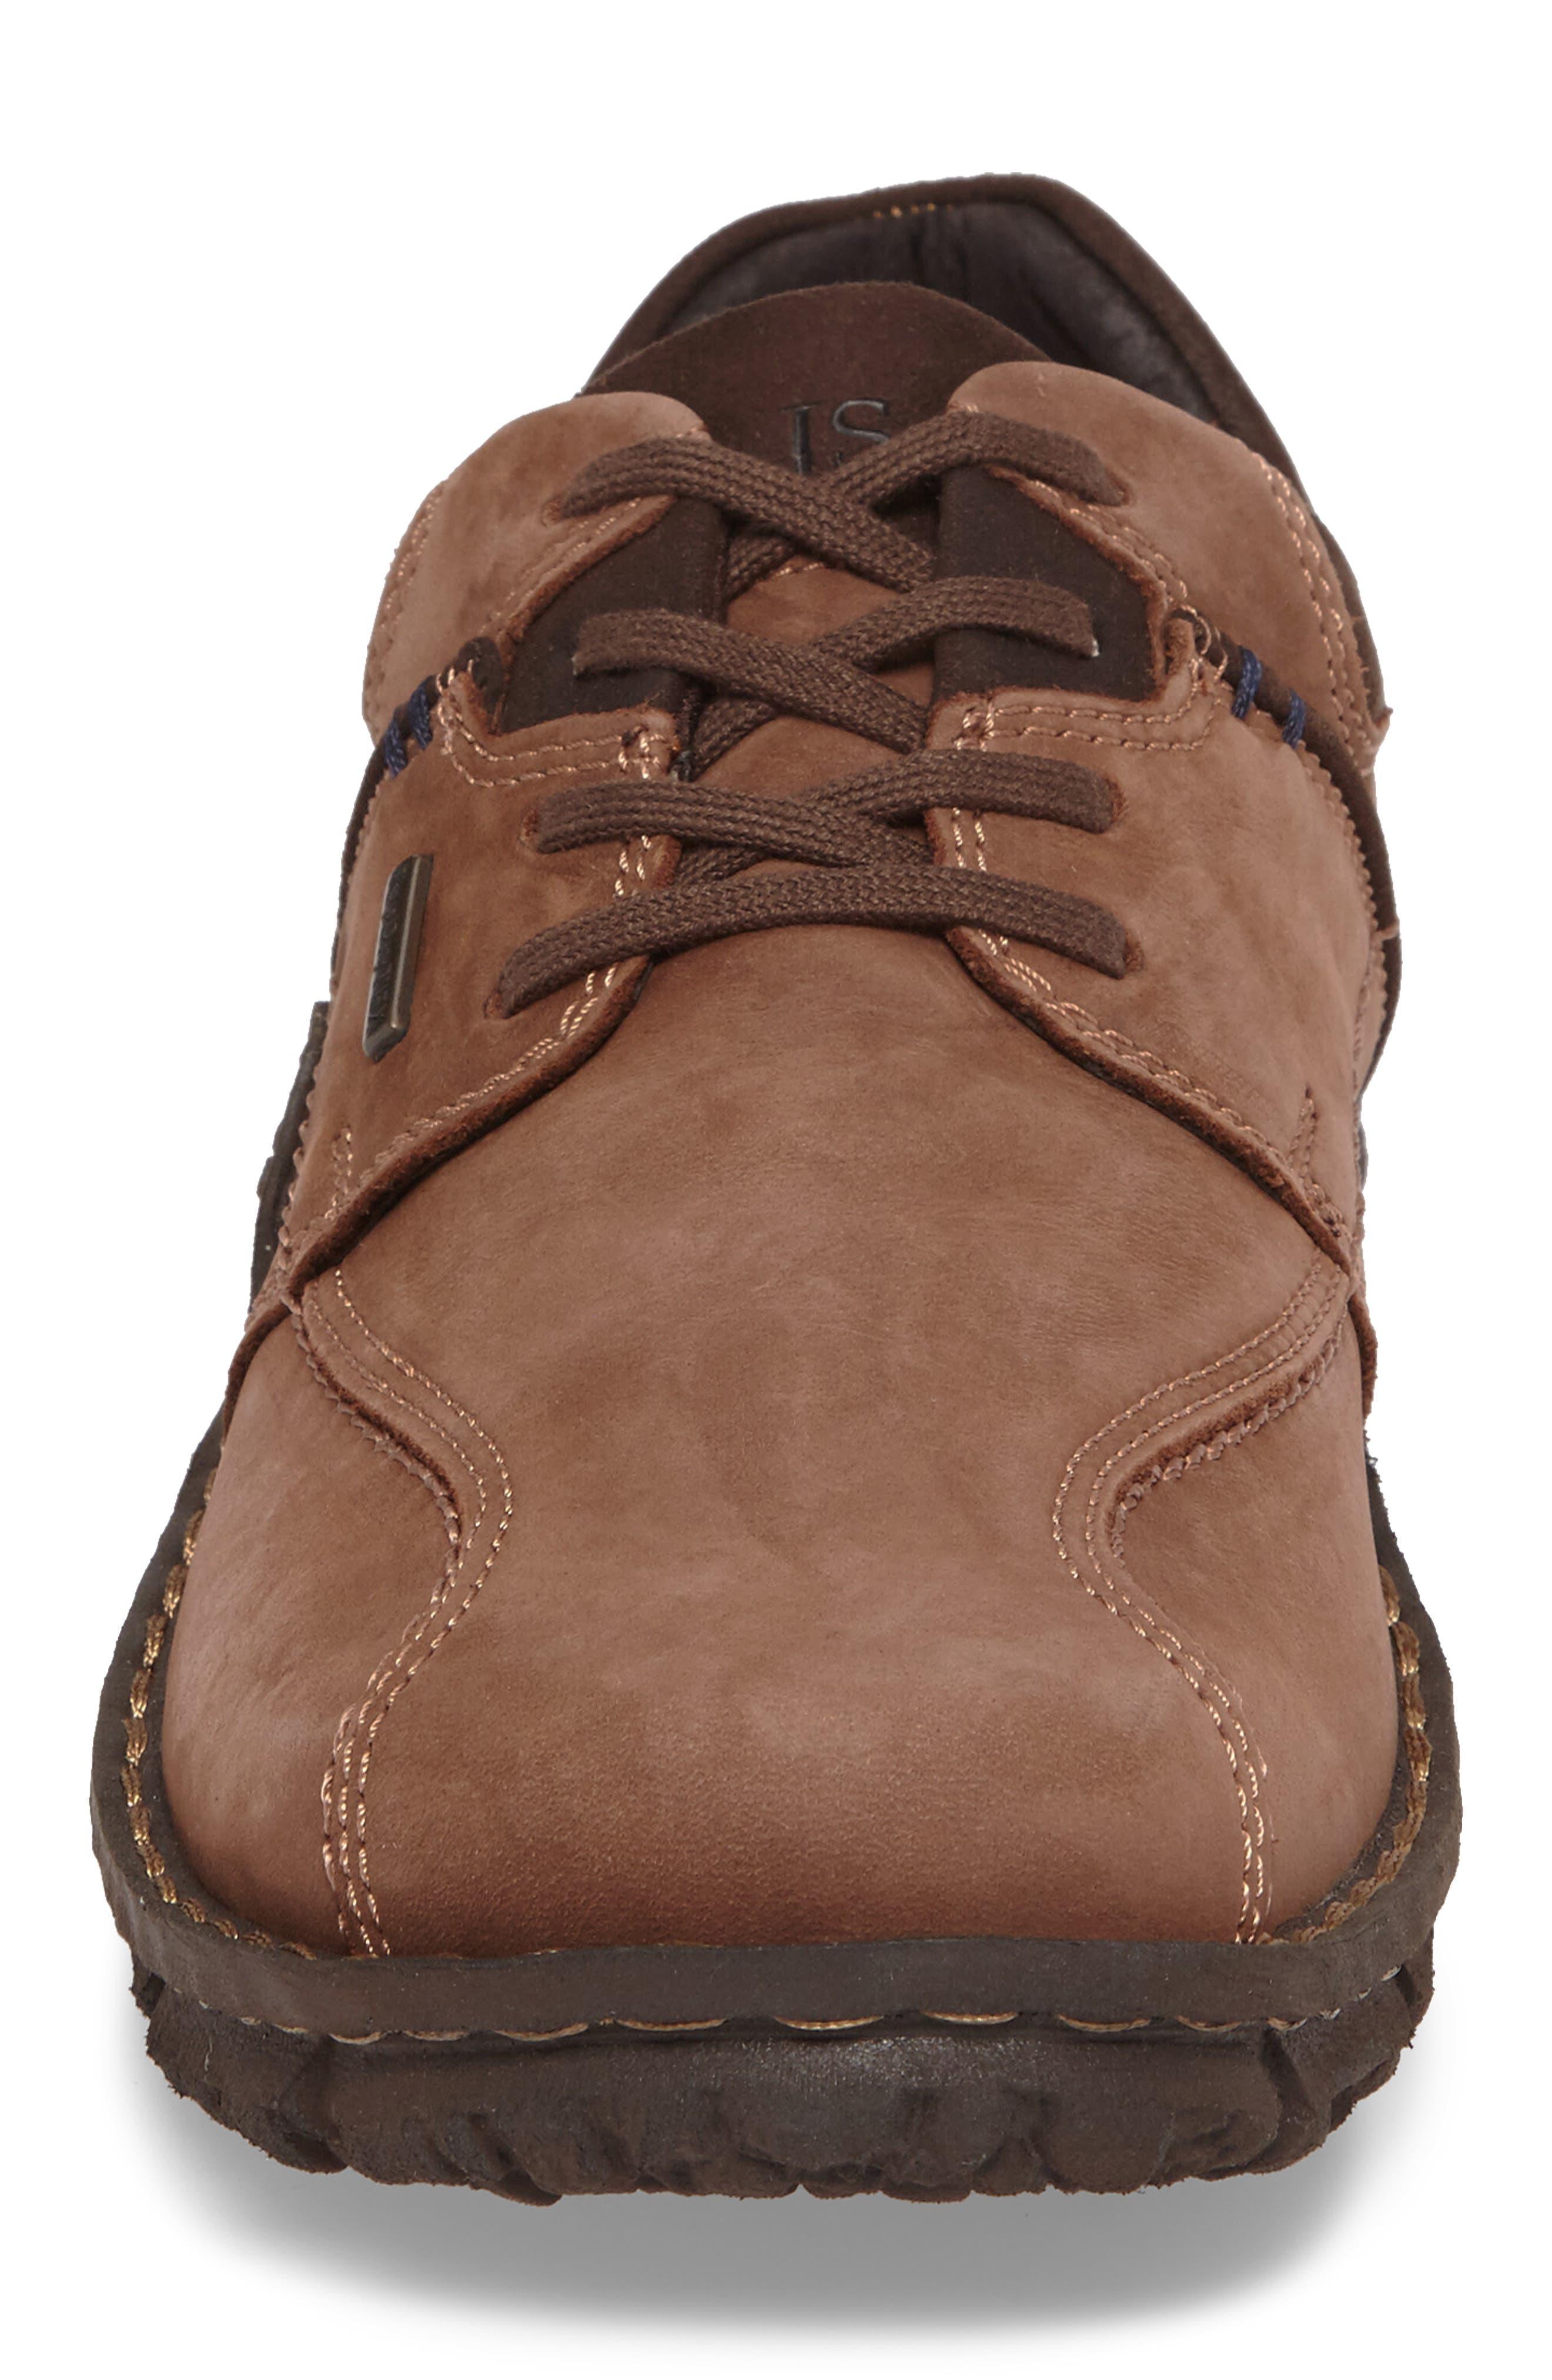 Willow Waterproof Sneaker,                             Alternate thumbnail 4, color,                             Castagne